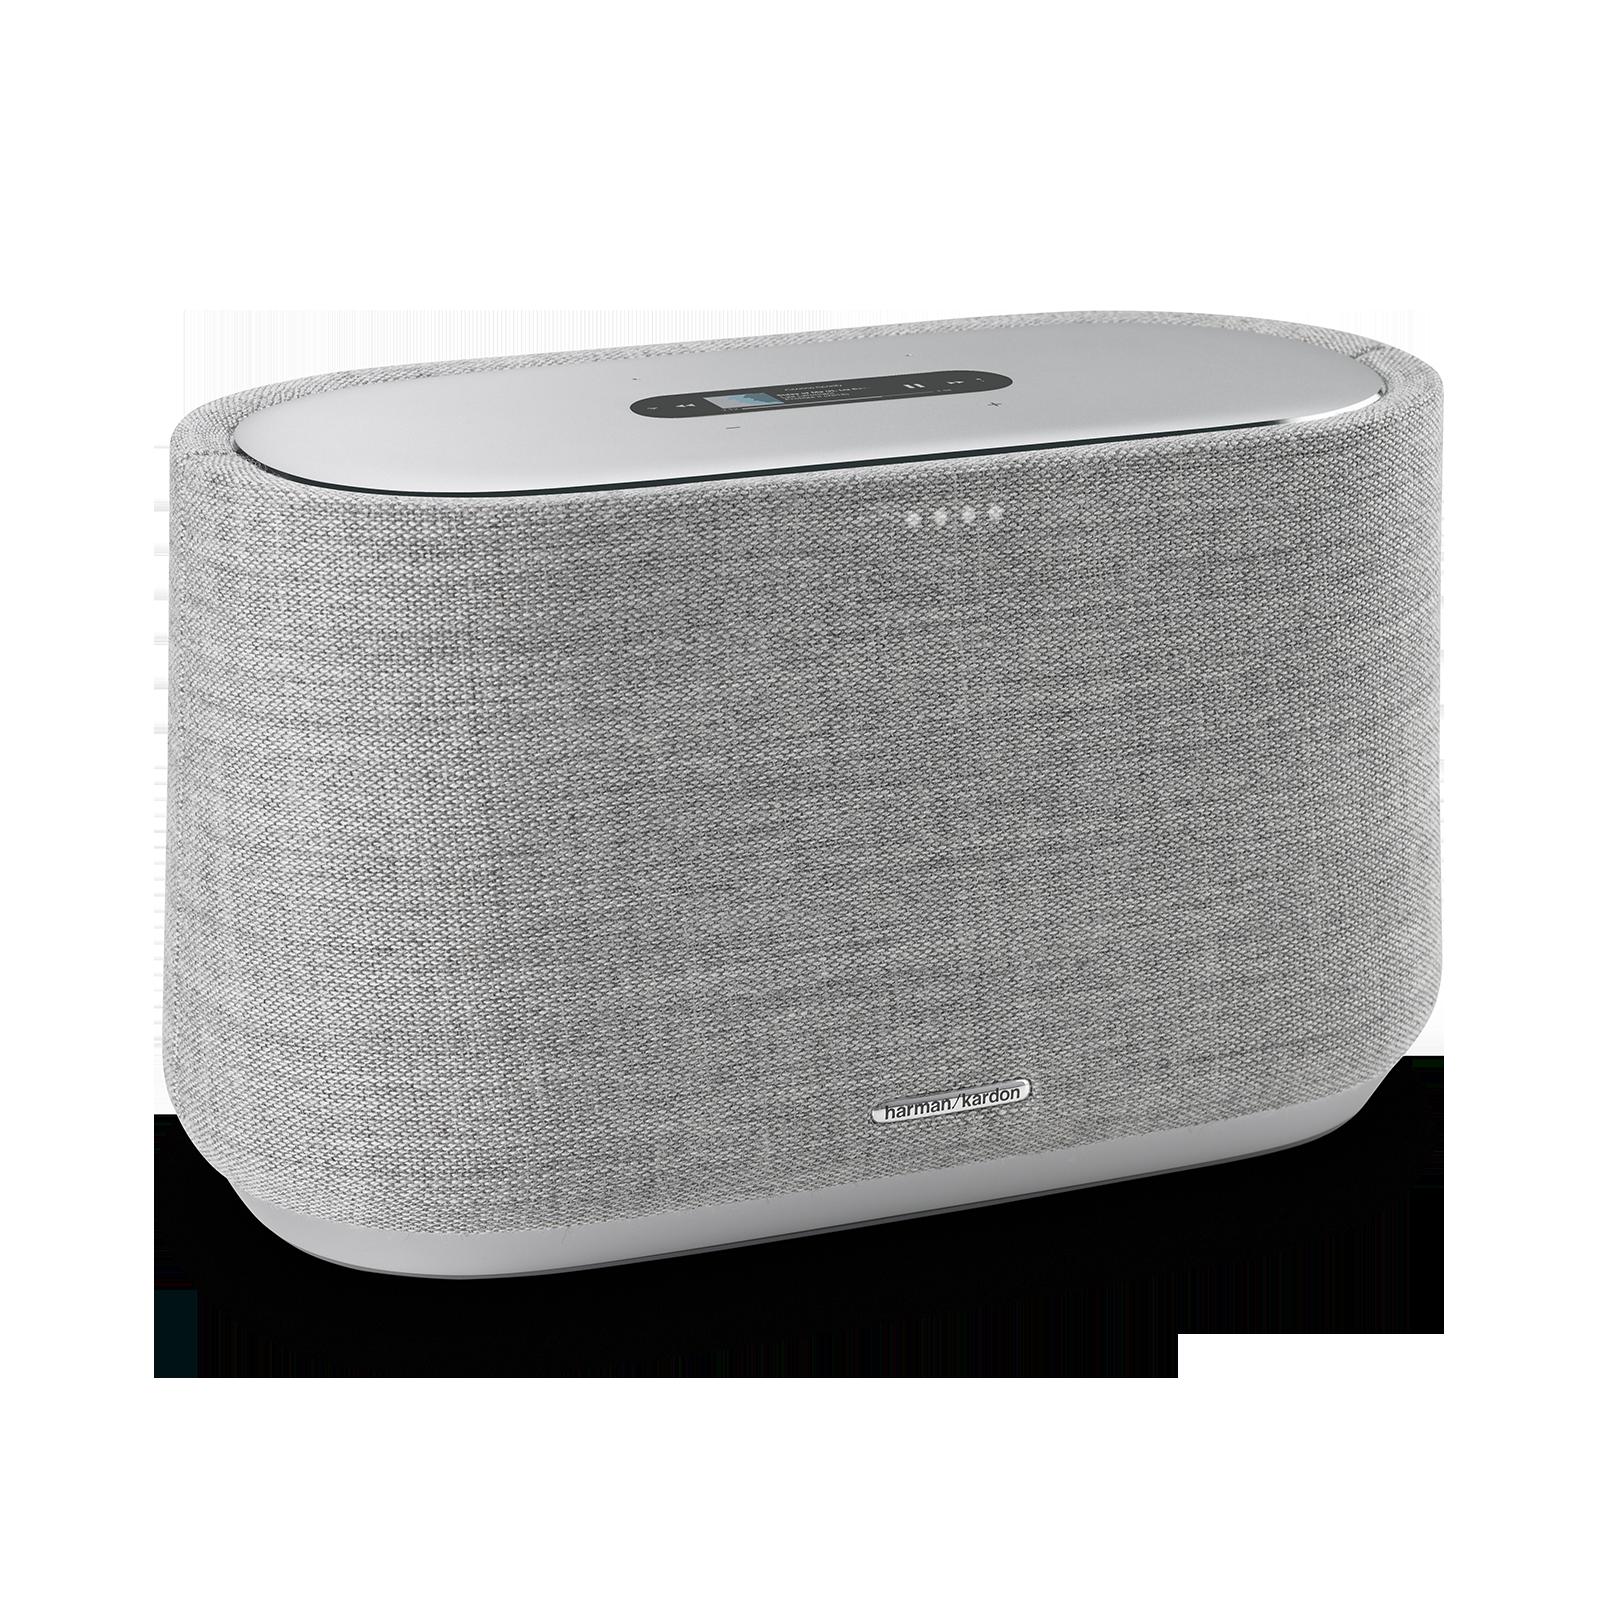 Harman Kardon Citation 300 - Grey - The medium-size smart home speaker with award winning design - Hero